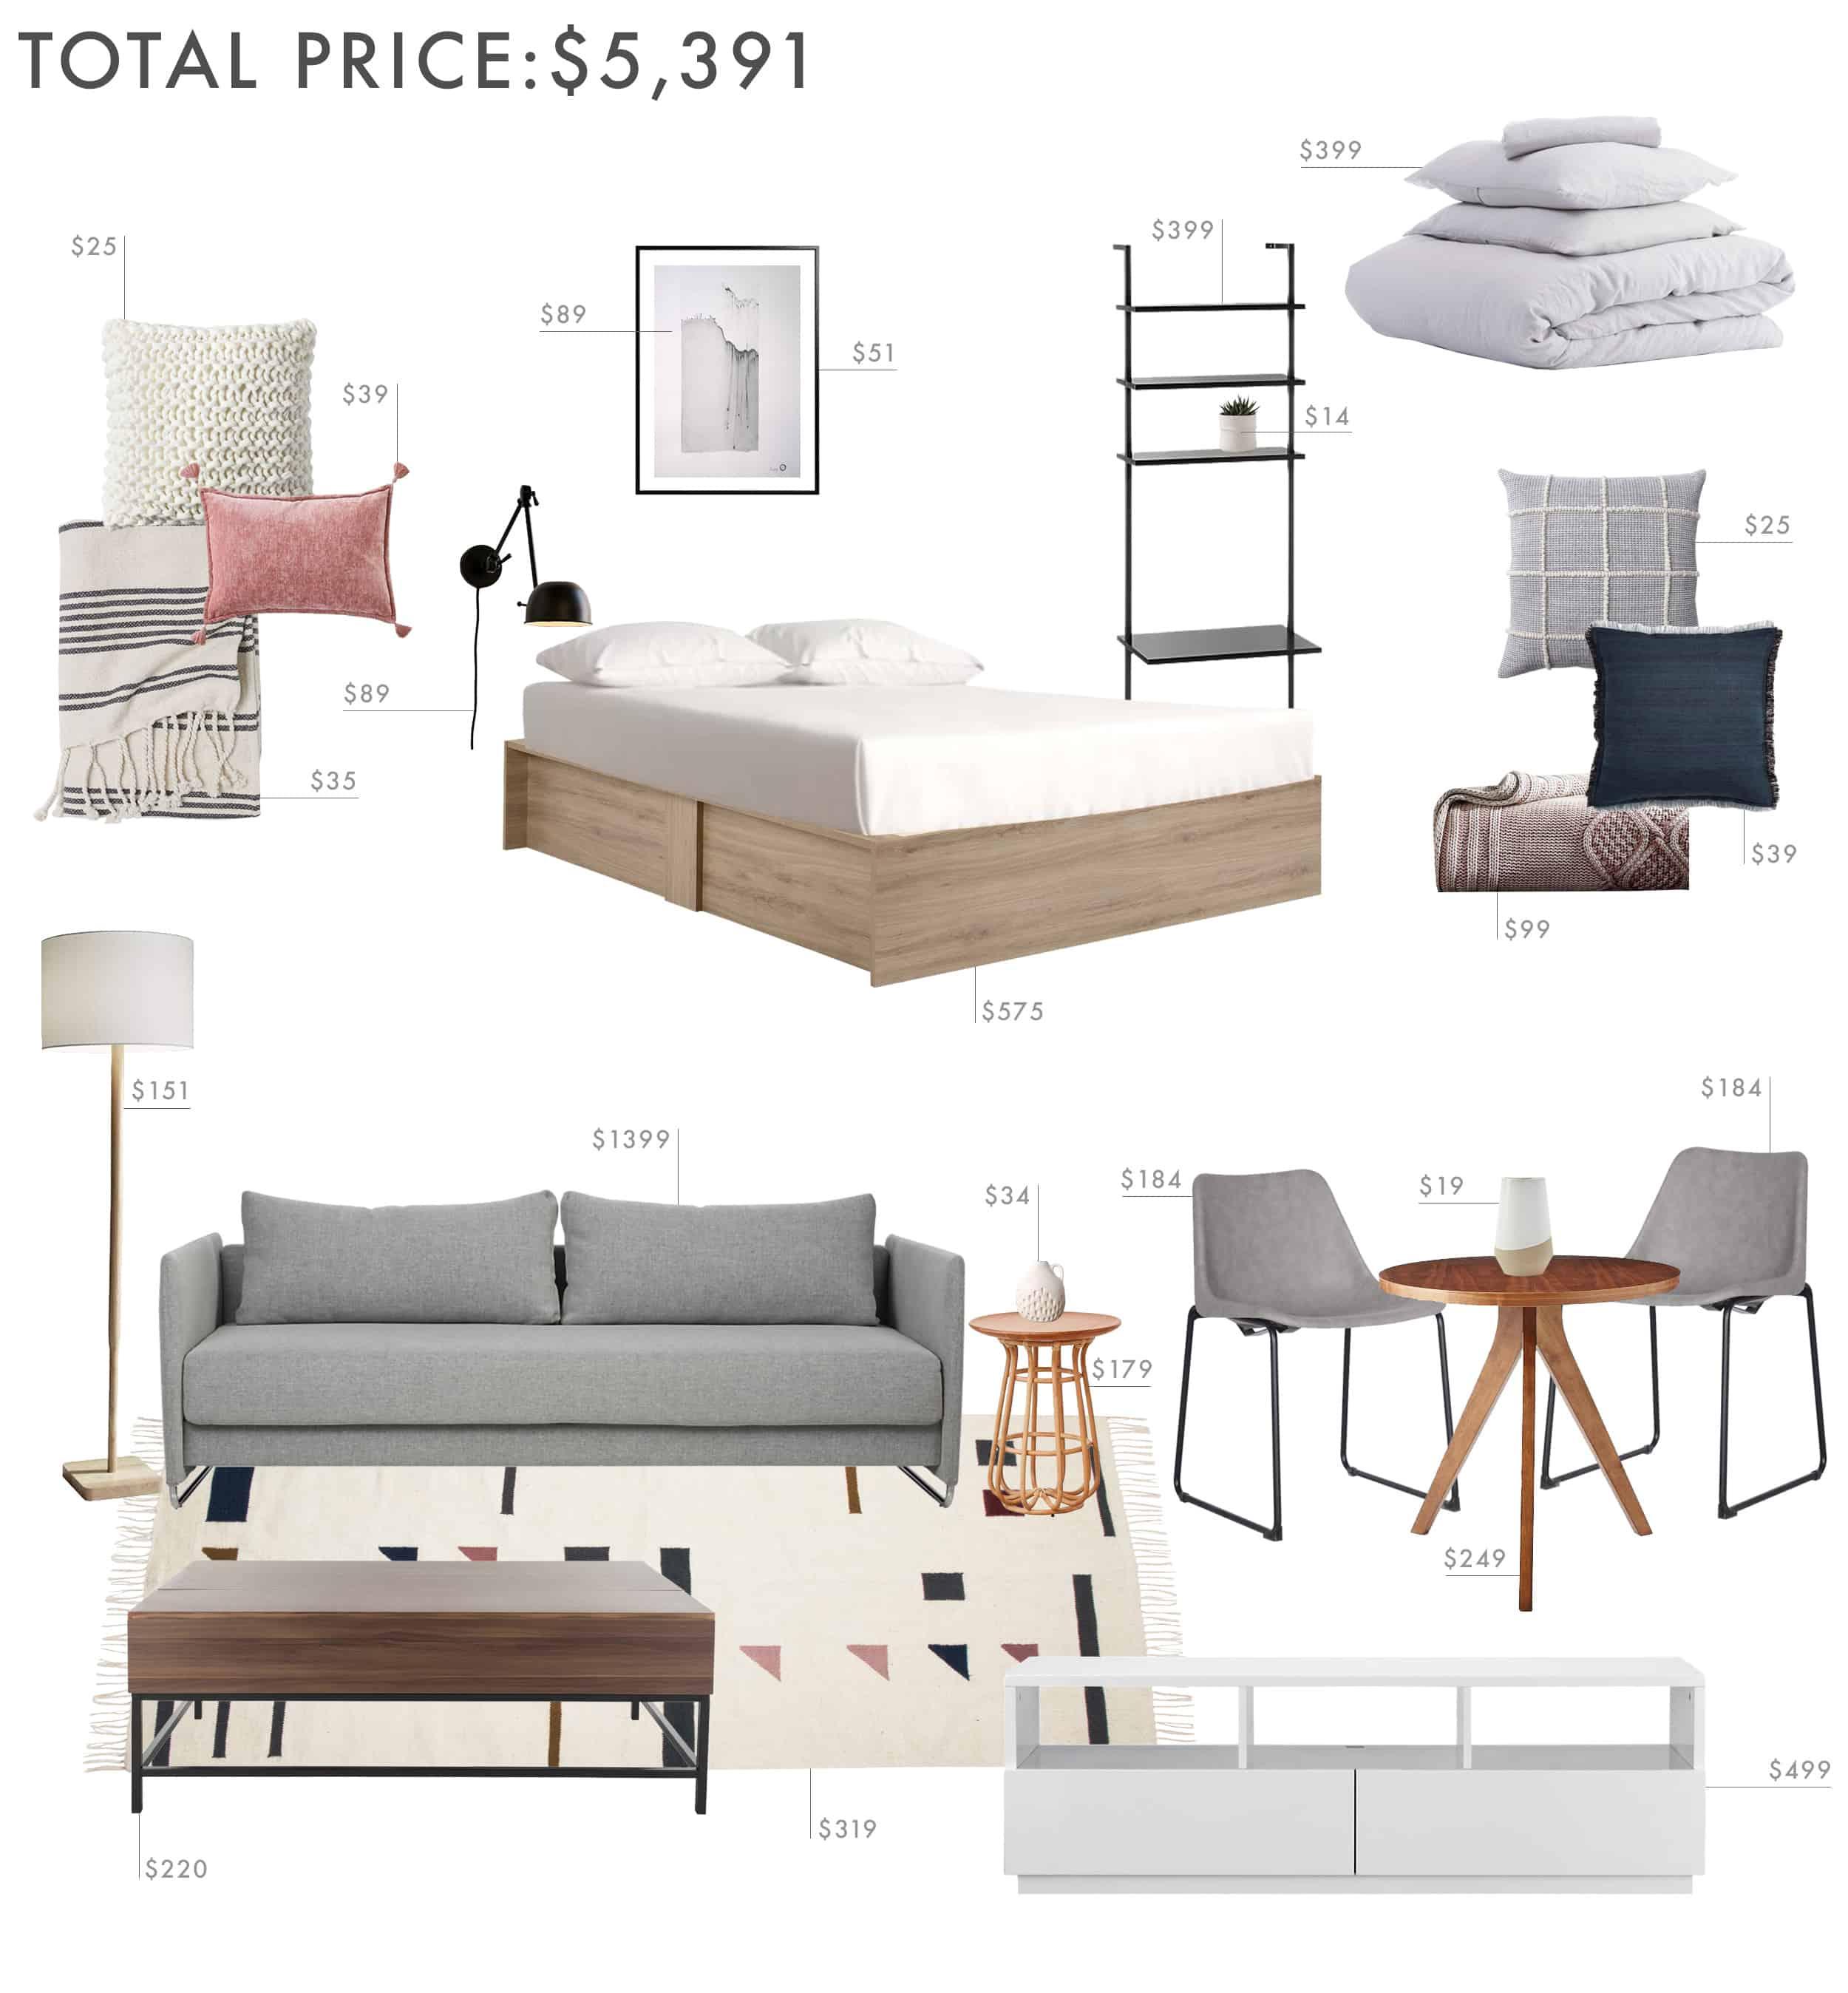 Emily Henderson Budget Room Studio Apartment 500sq Ft Under 5000k 1